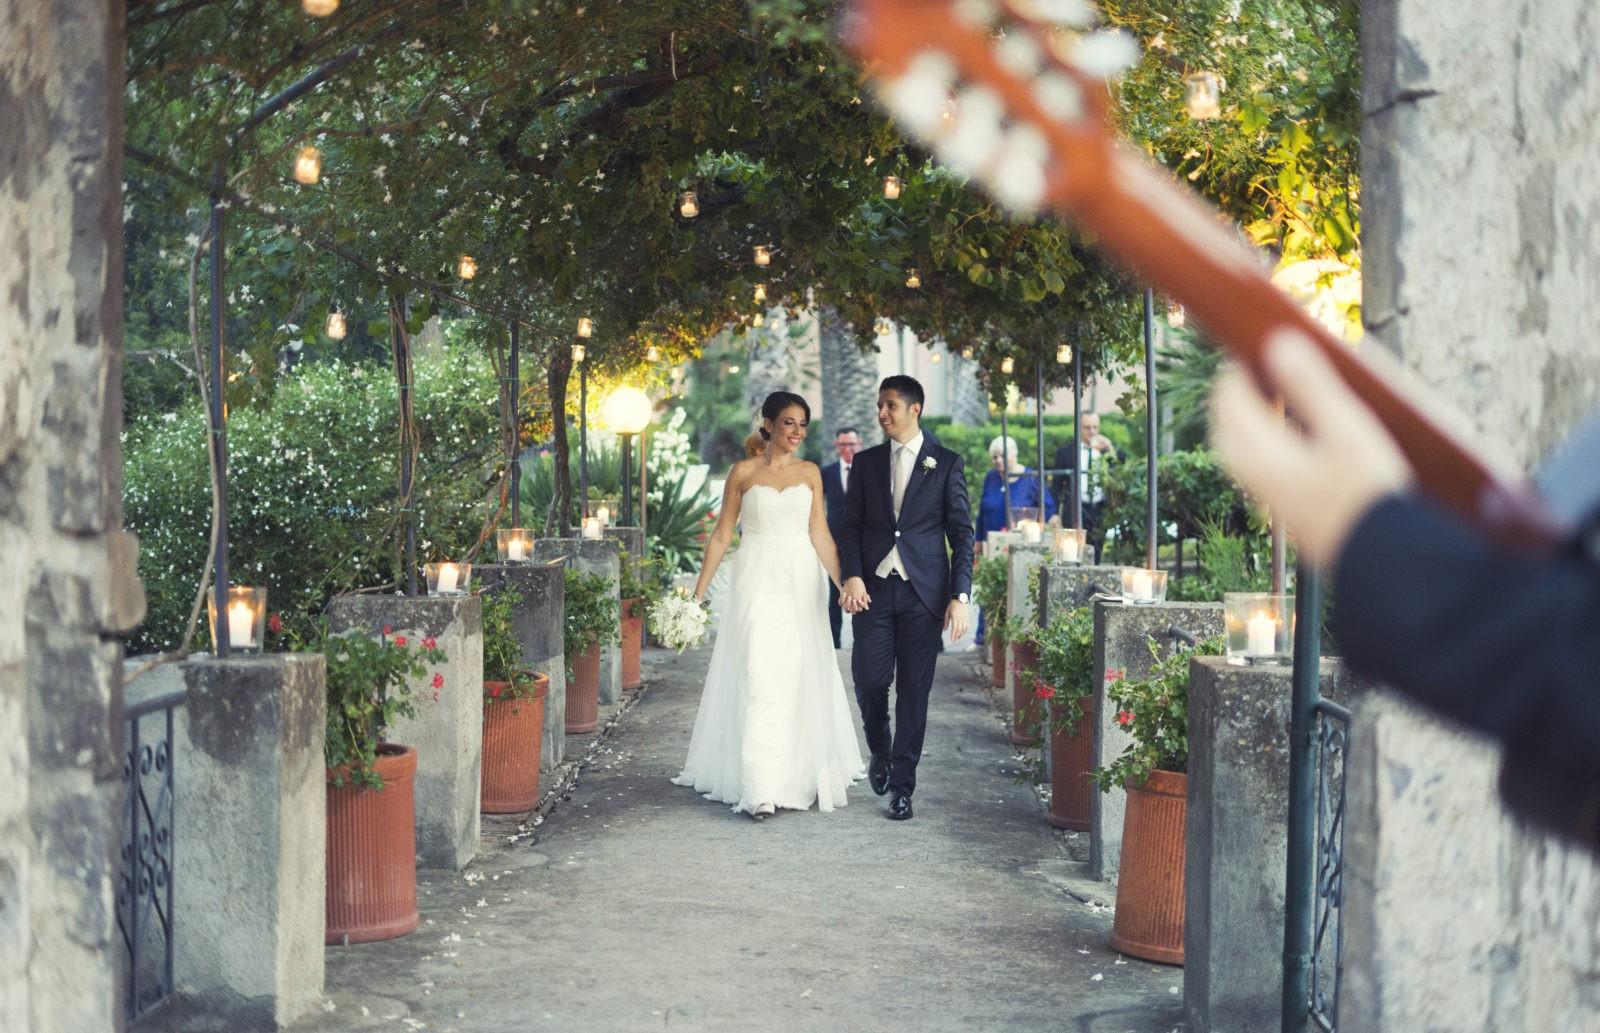 Dylan Bertolini Fotografo, fotografo napoli, fotografo campania, foto matrimonio campania, dylan bertolini foto sposi campania